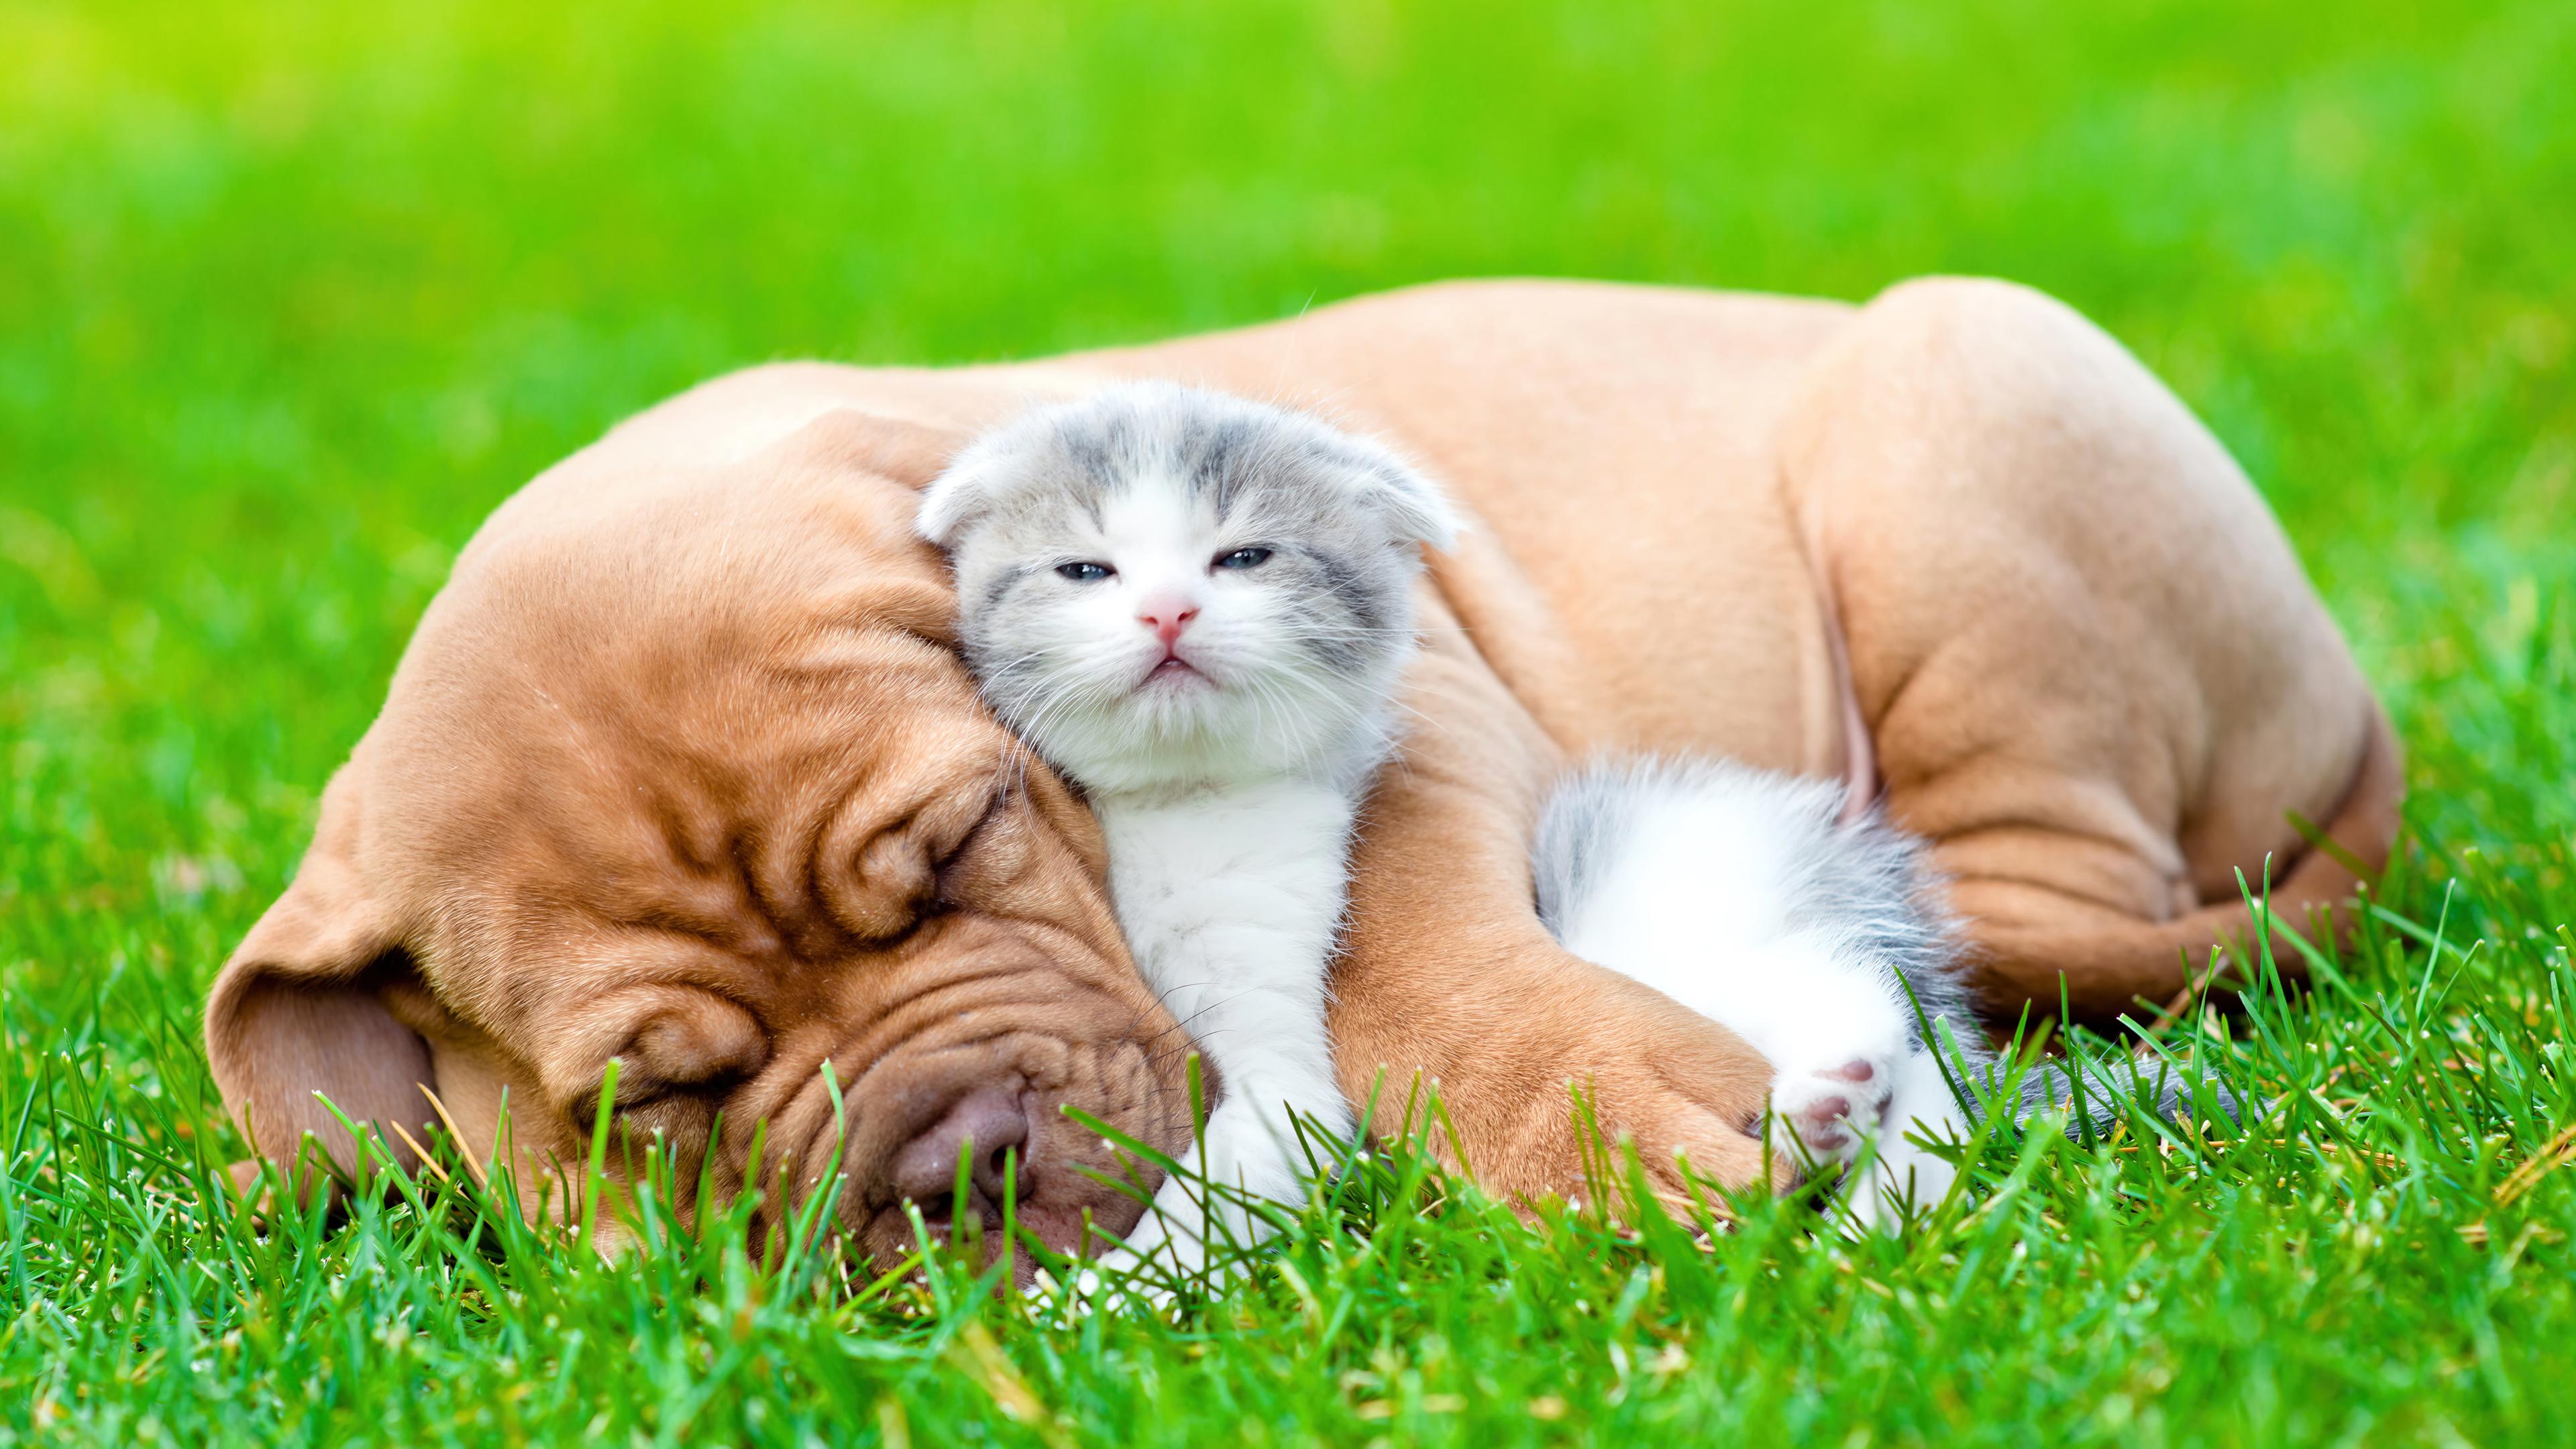 Fondos de pantalla Bulldog y gato